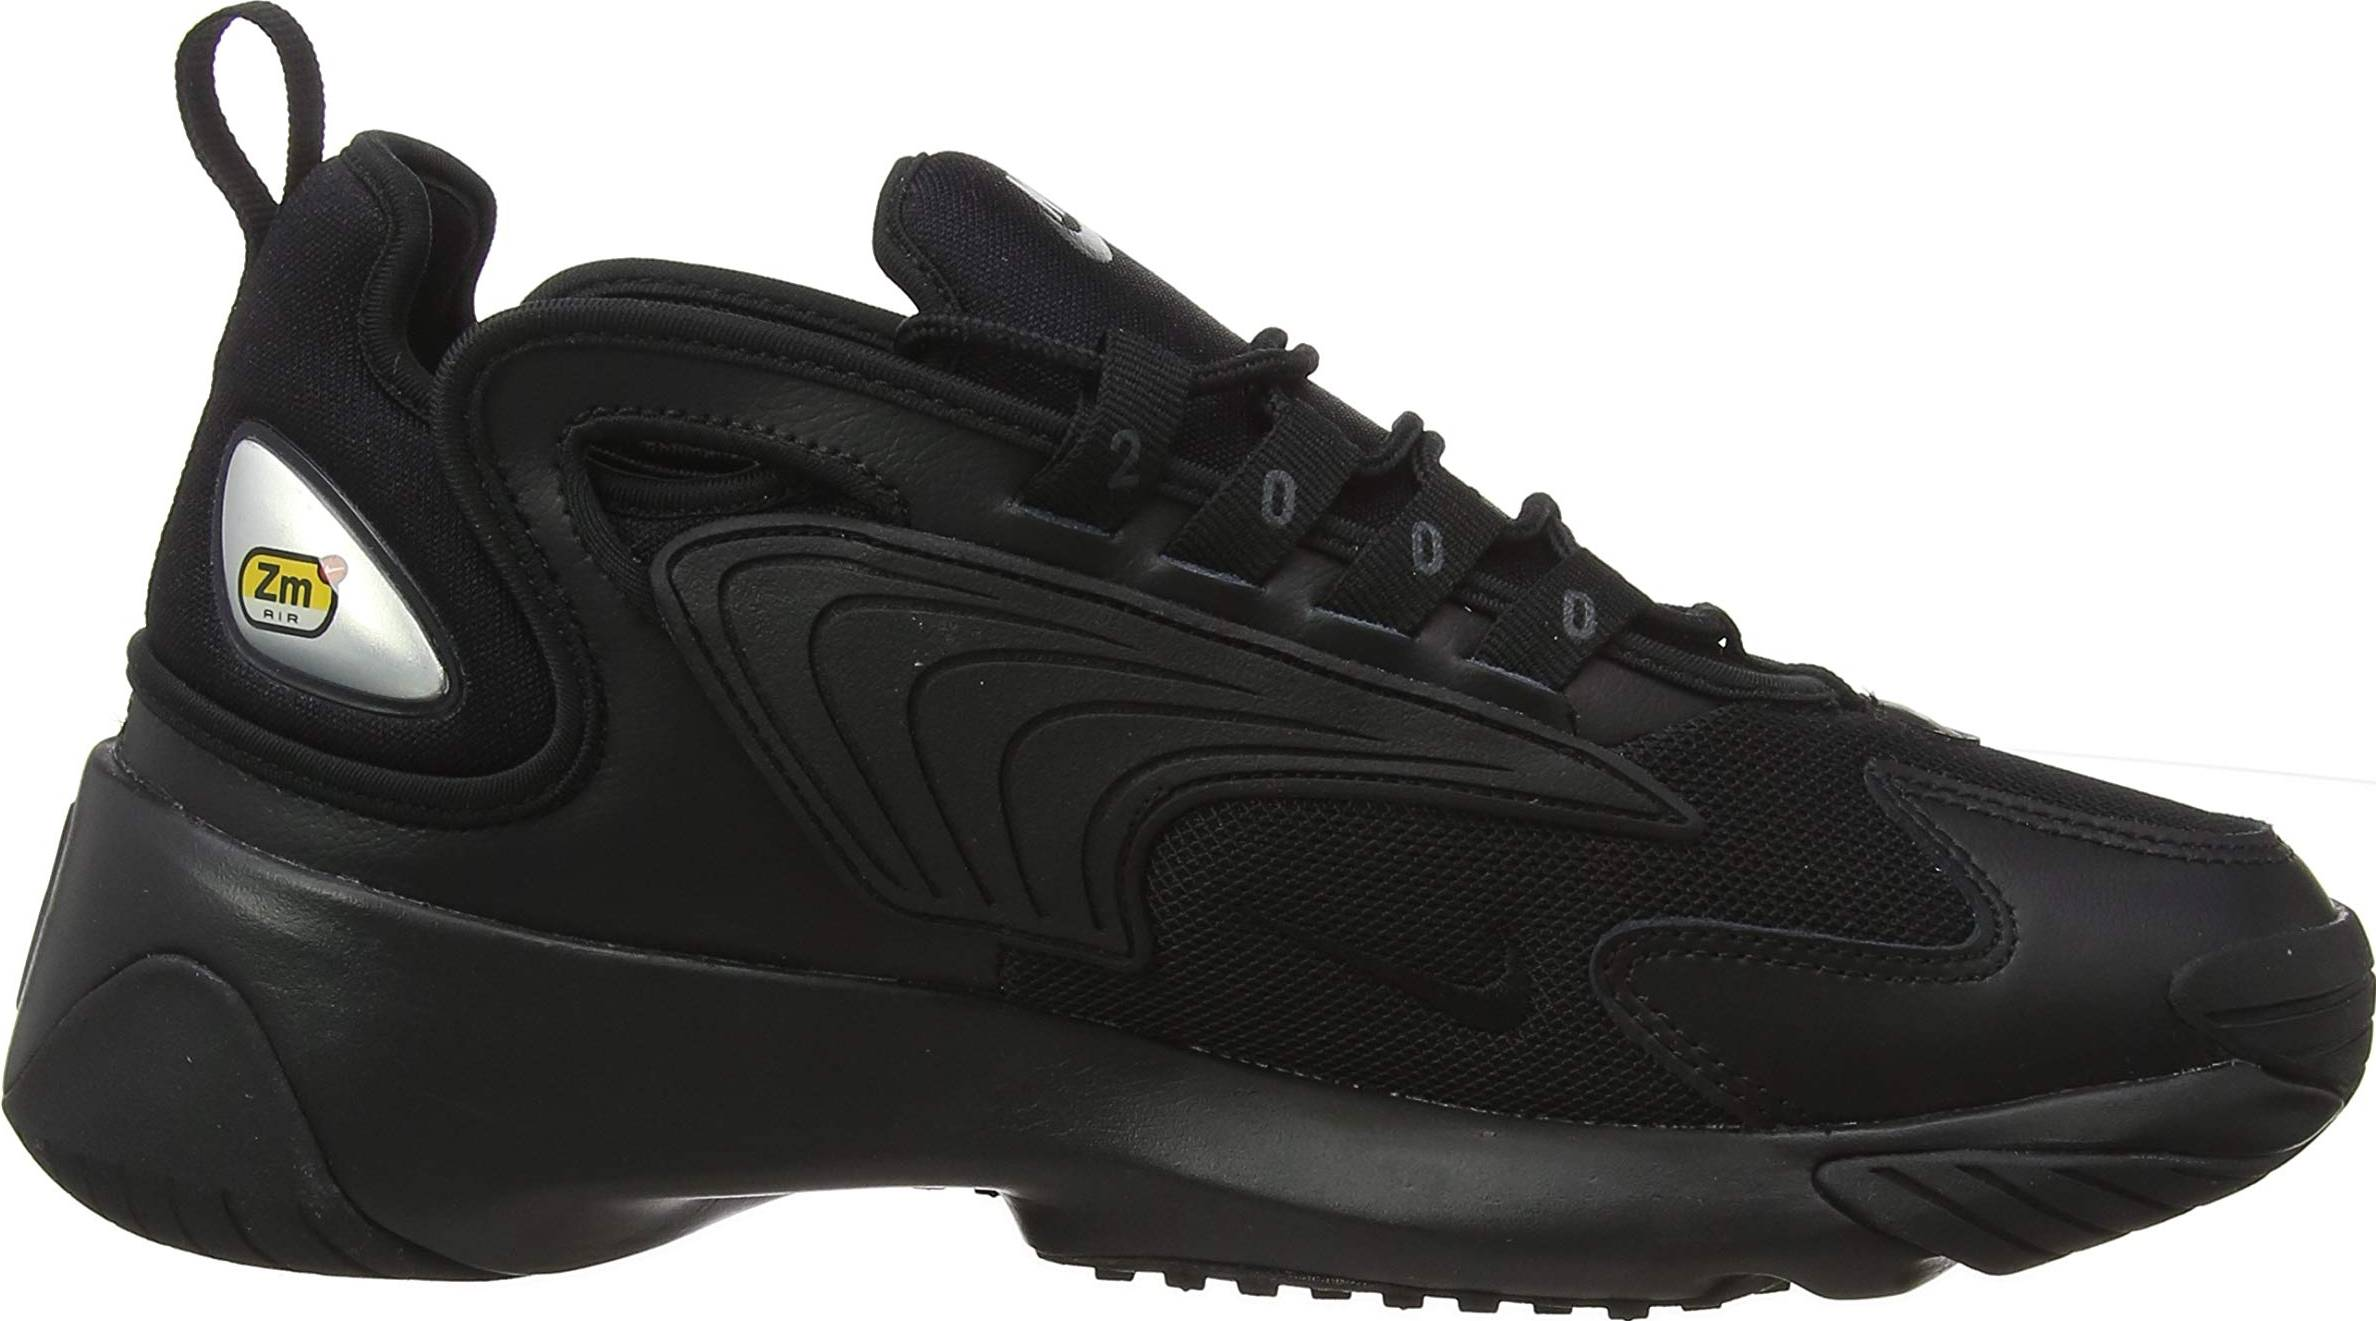 Ondas Surtido Afirmar  Nike Zoom 2K sneakers in 10+ colors (only $56)   RunRepeat